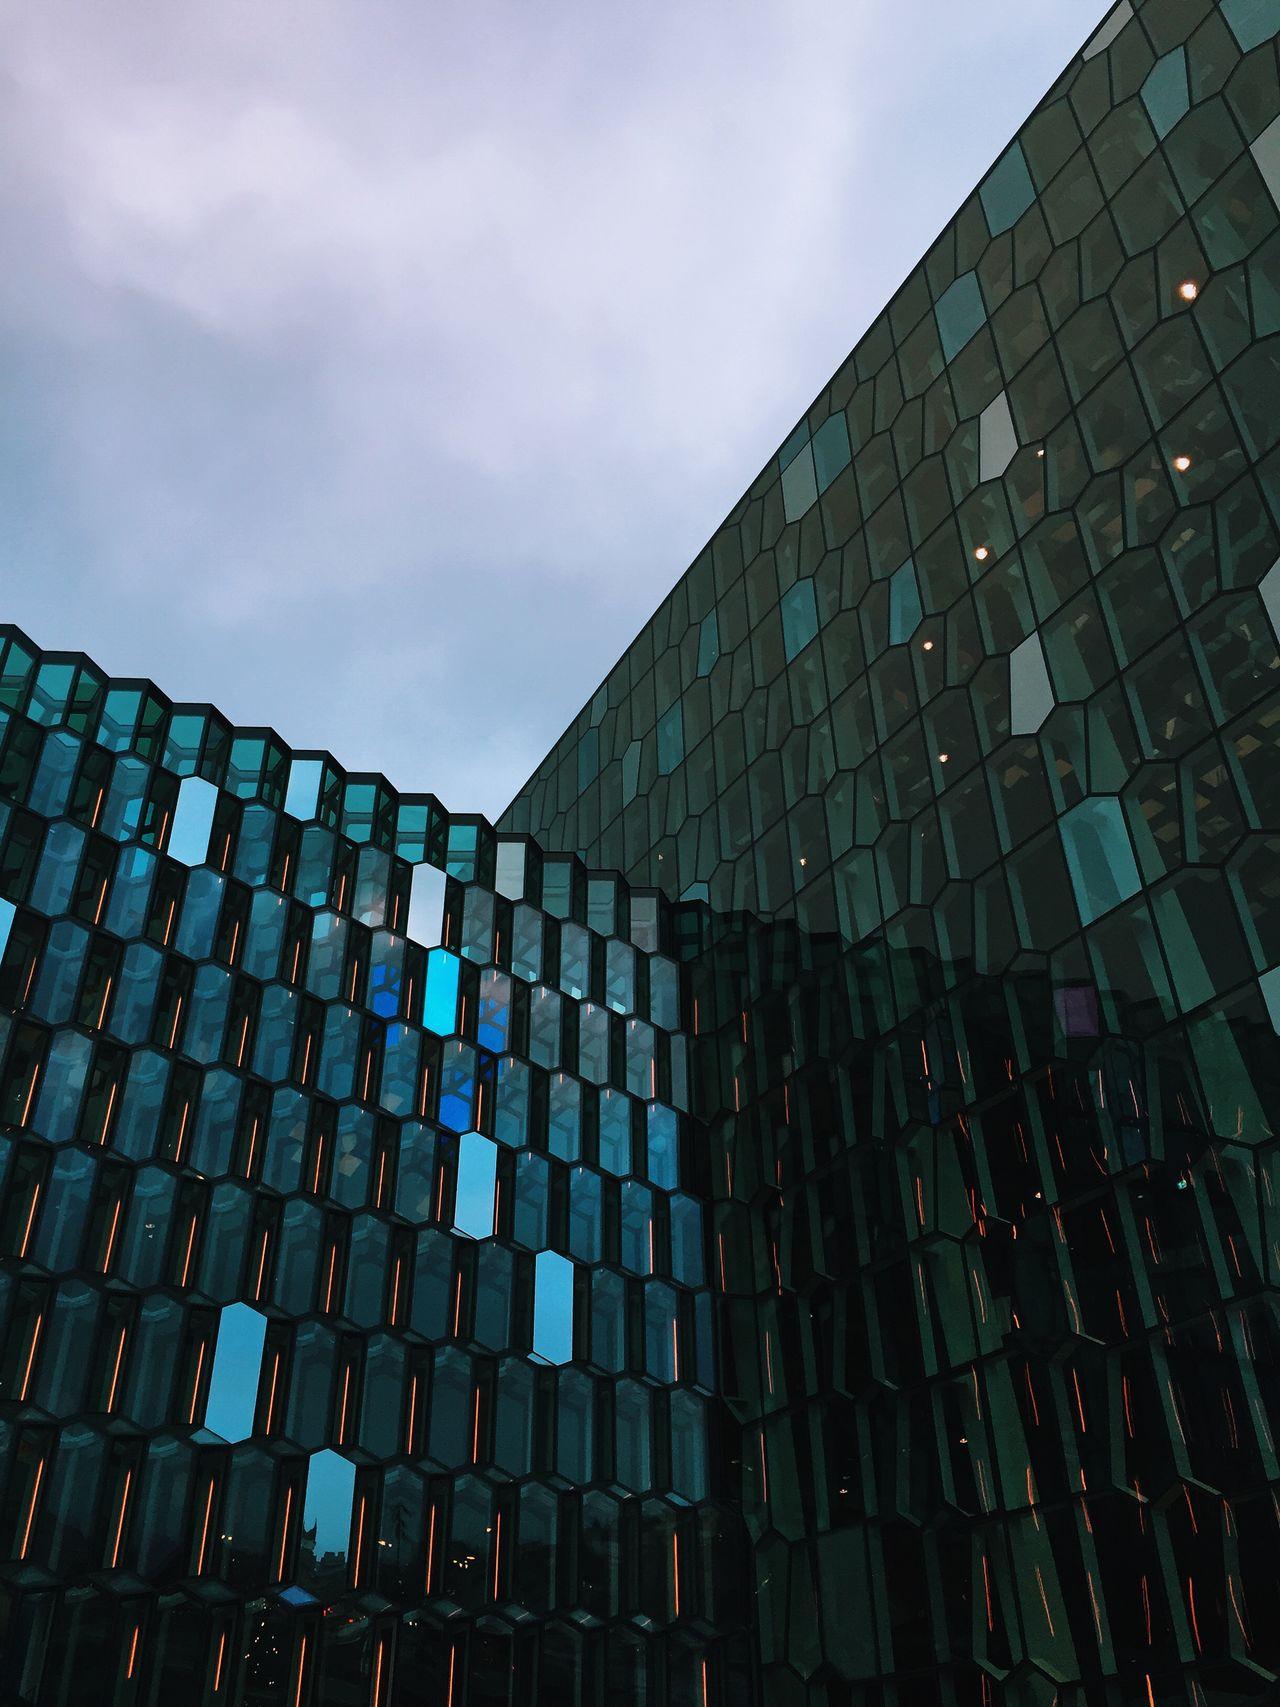 Reykjavik Harpa Olafur Eliasson Iceland